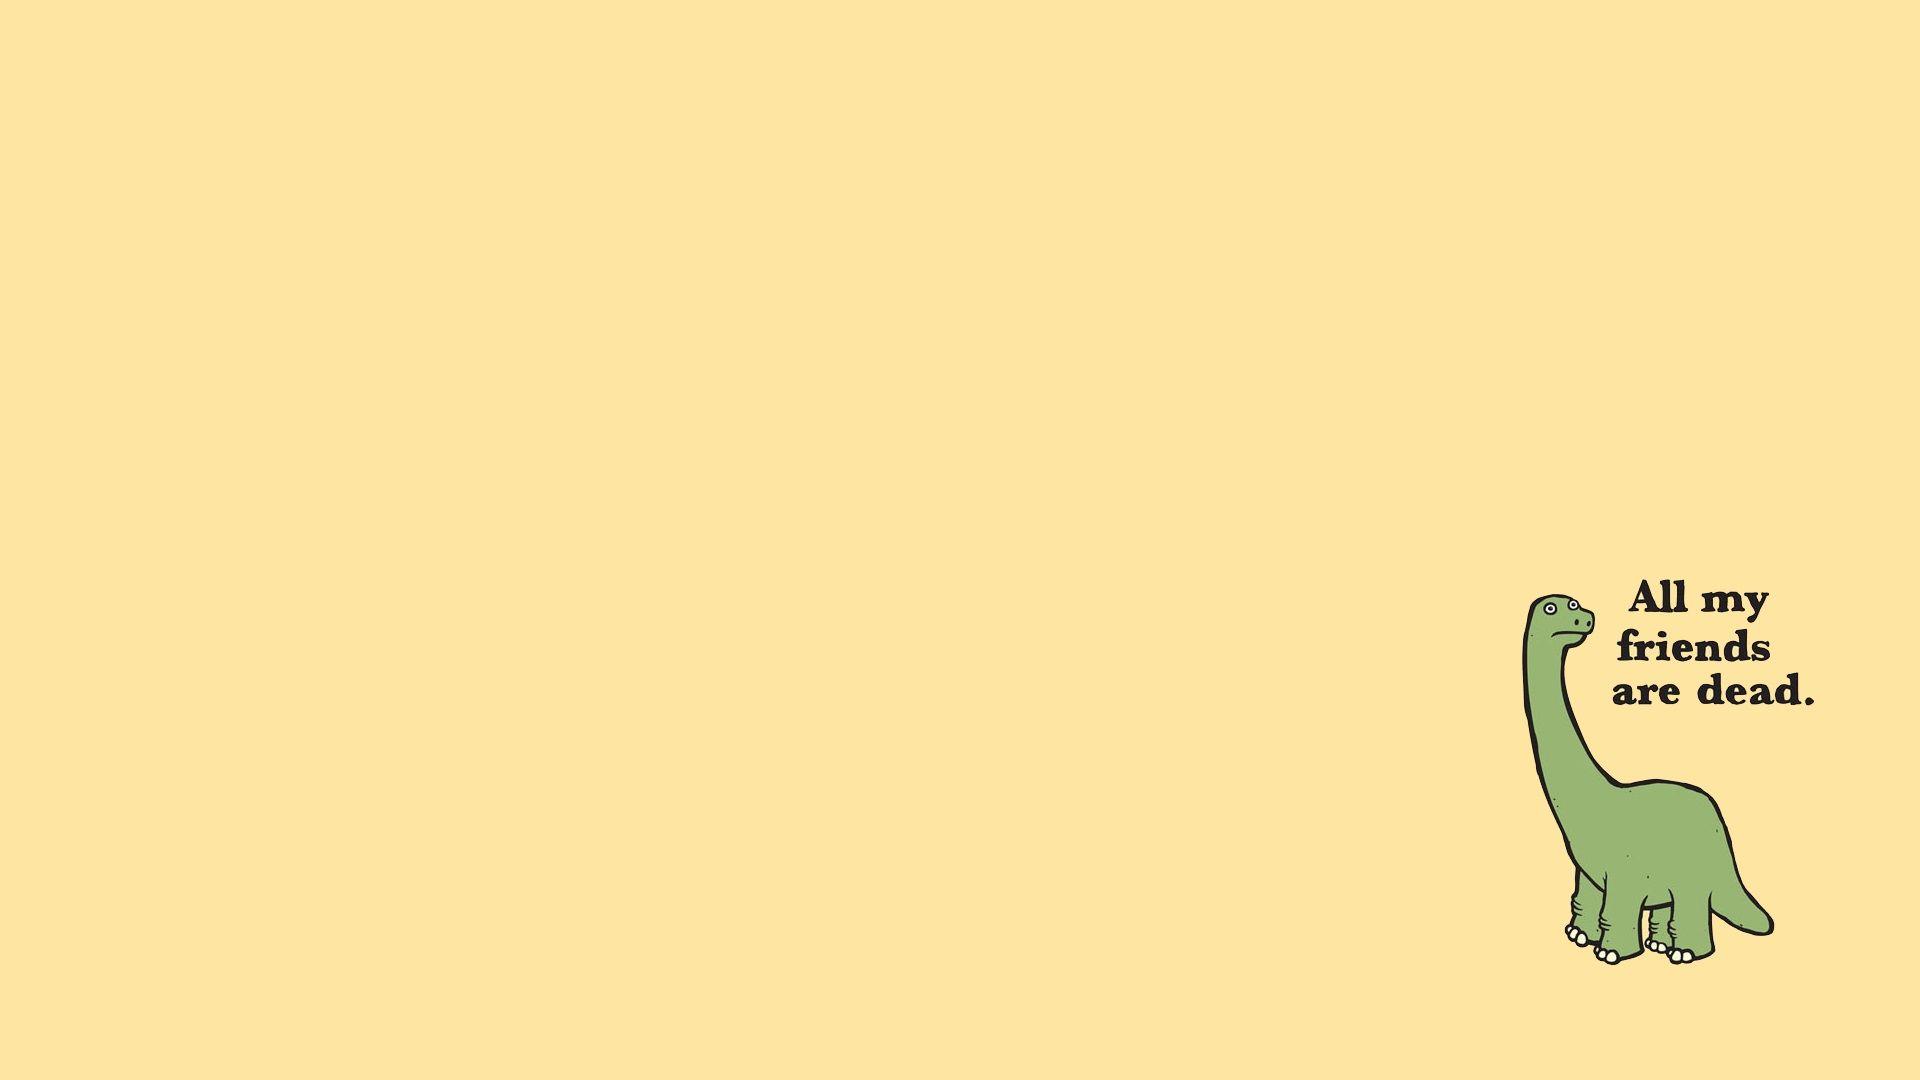 Pin On Desktop Wallpaper 2020